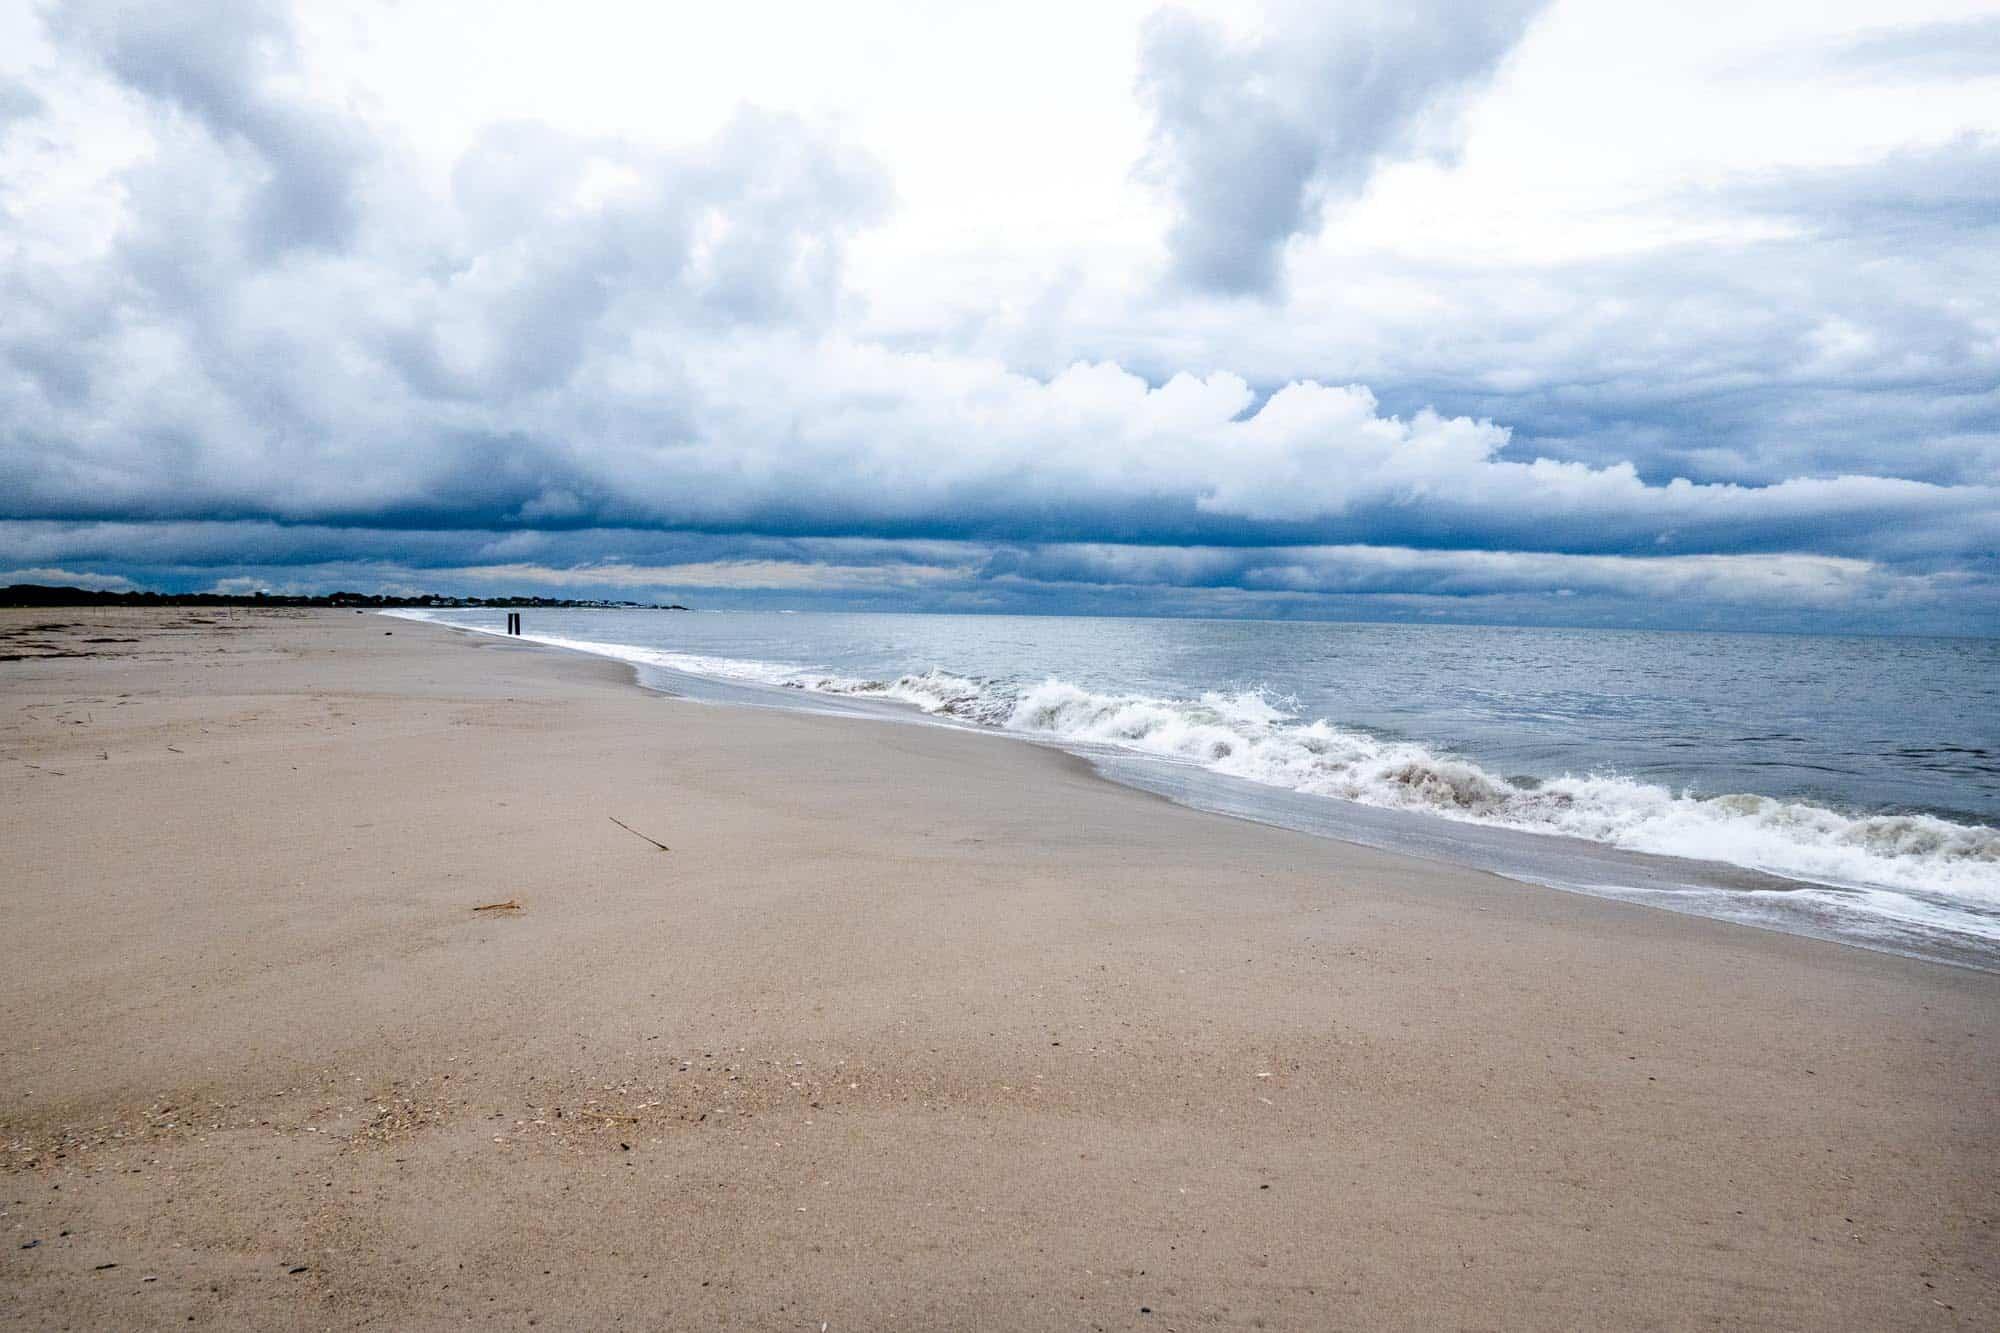 Waves crashing on sandy beach with cloudy sky